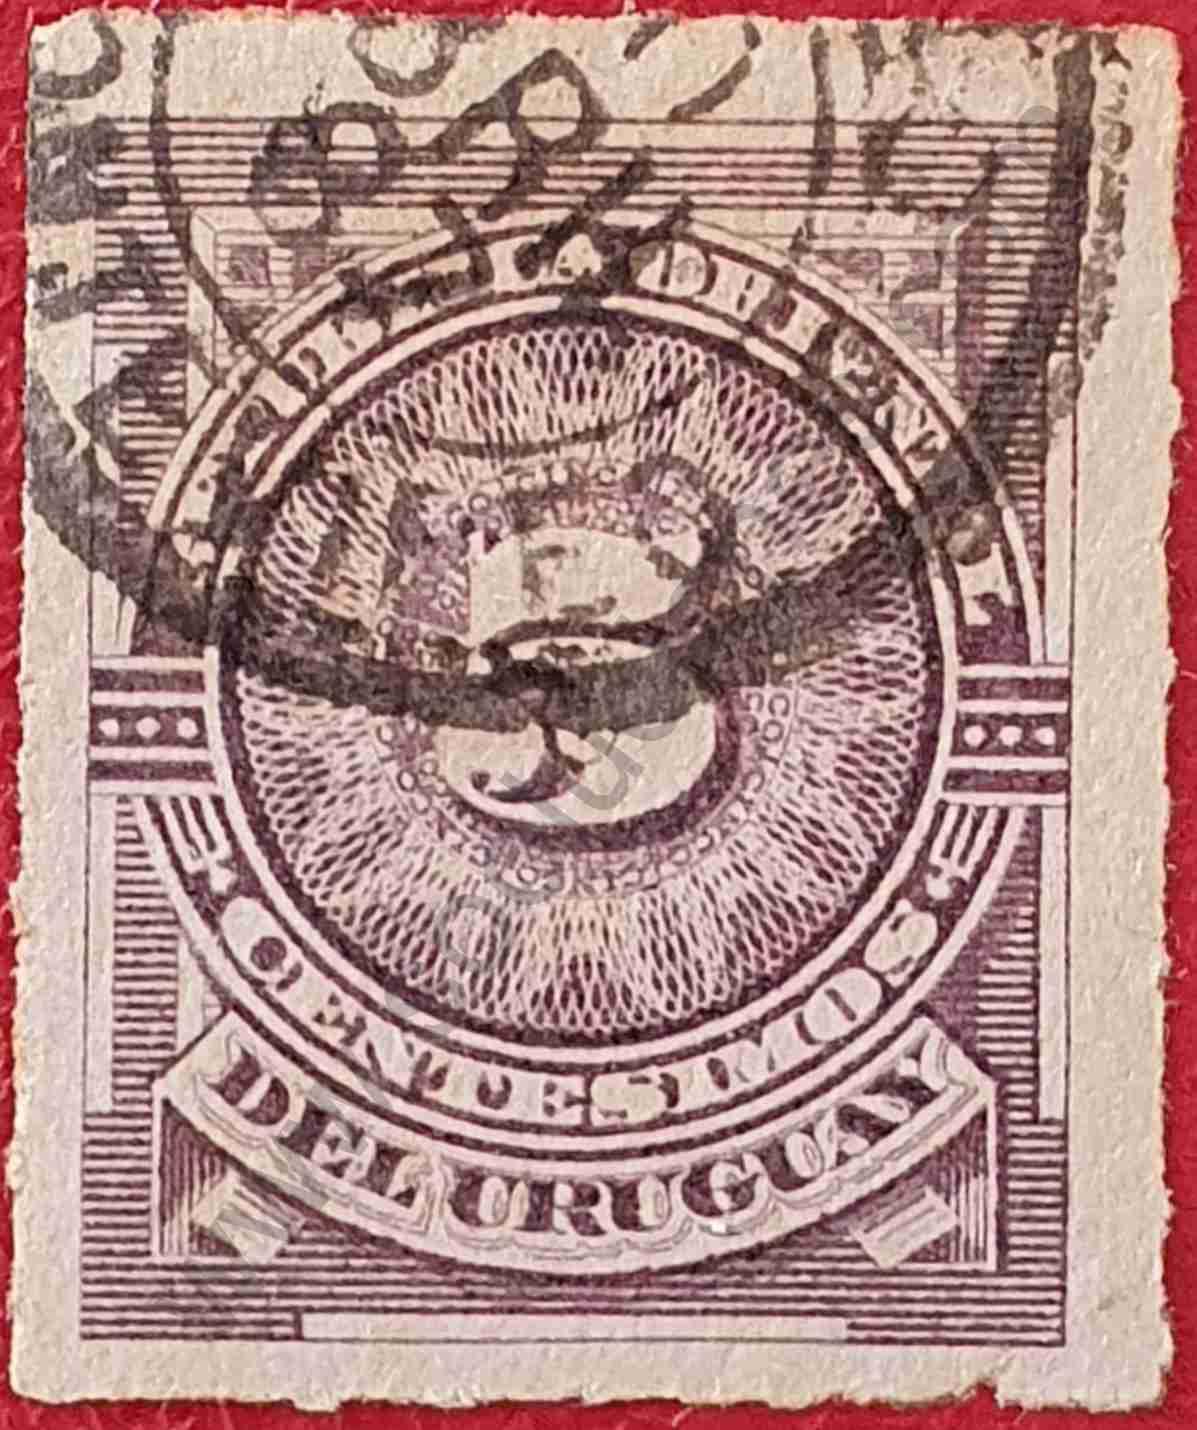 Número cinco - Sello Uruguay 1884